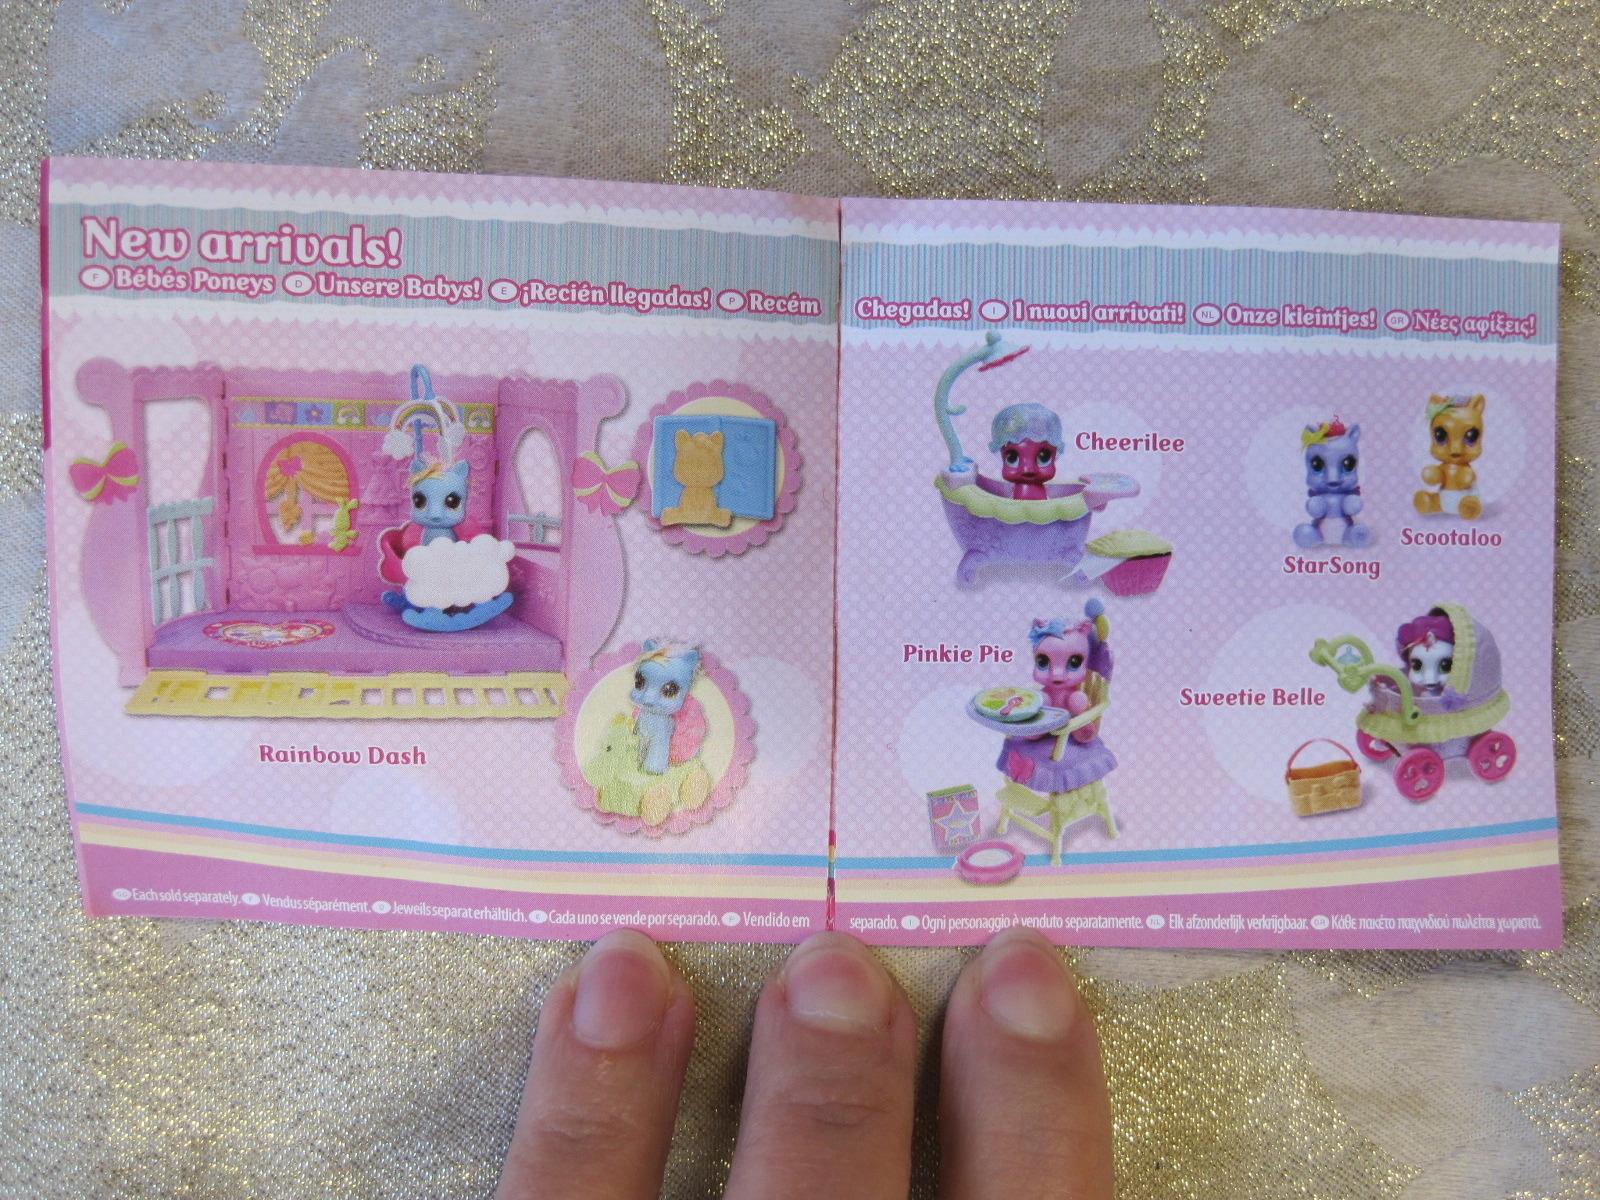 mes petits poneys g3 - Page 5 Img_9398